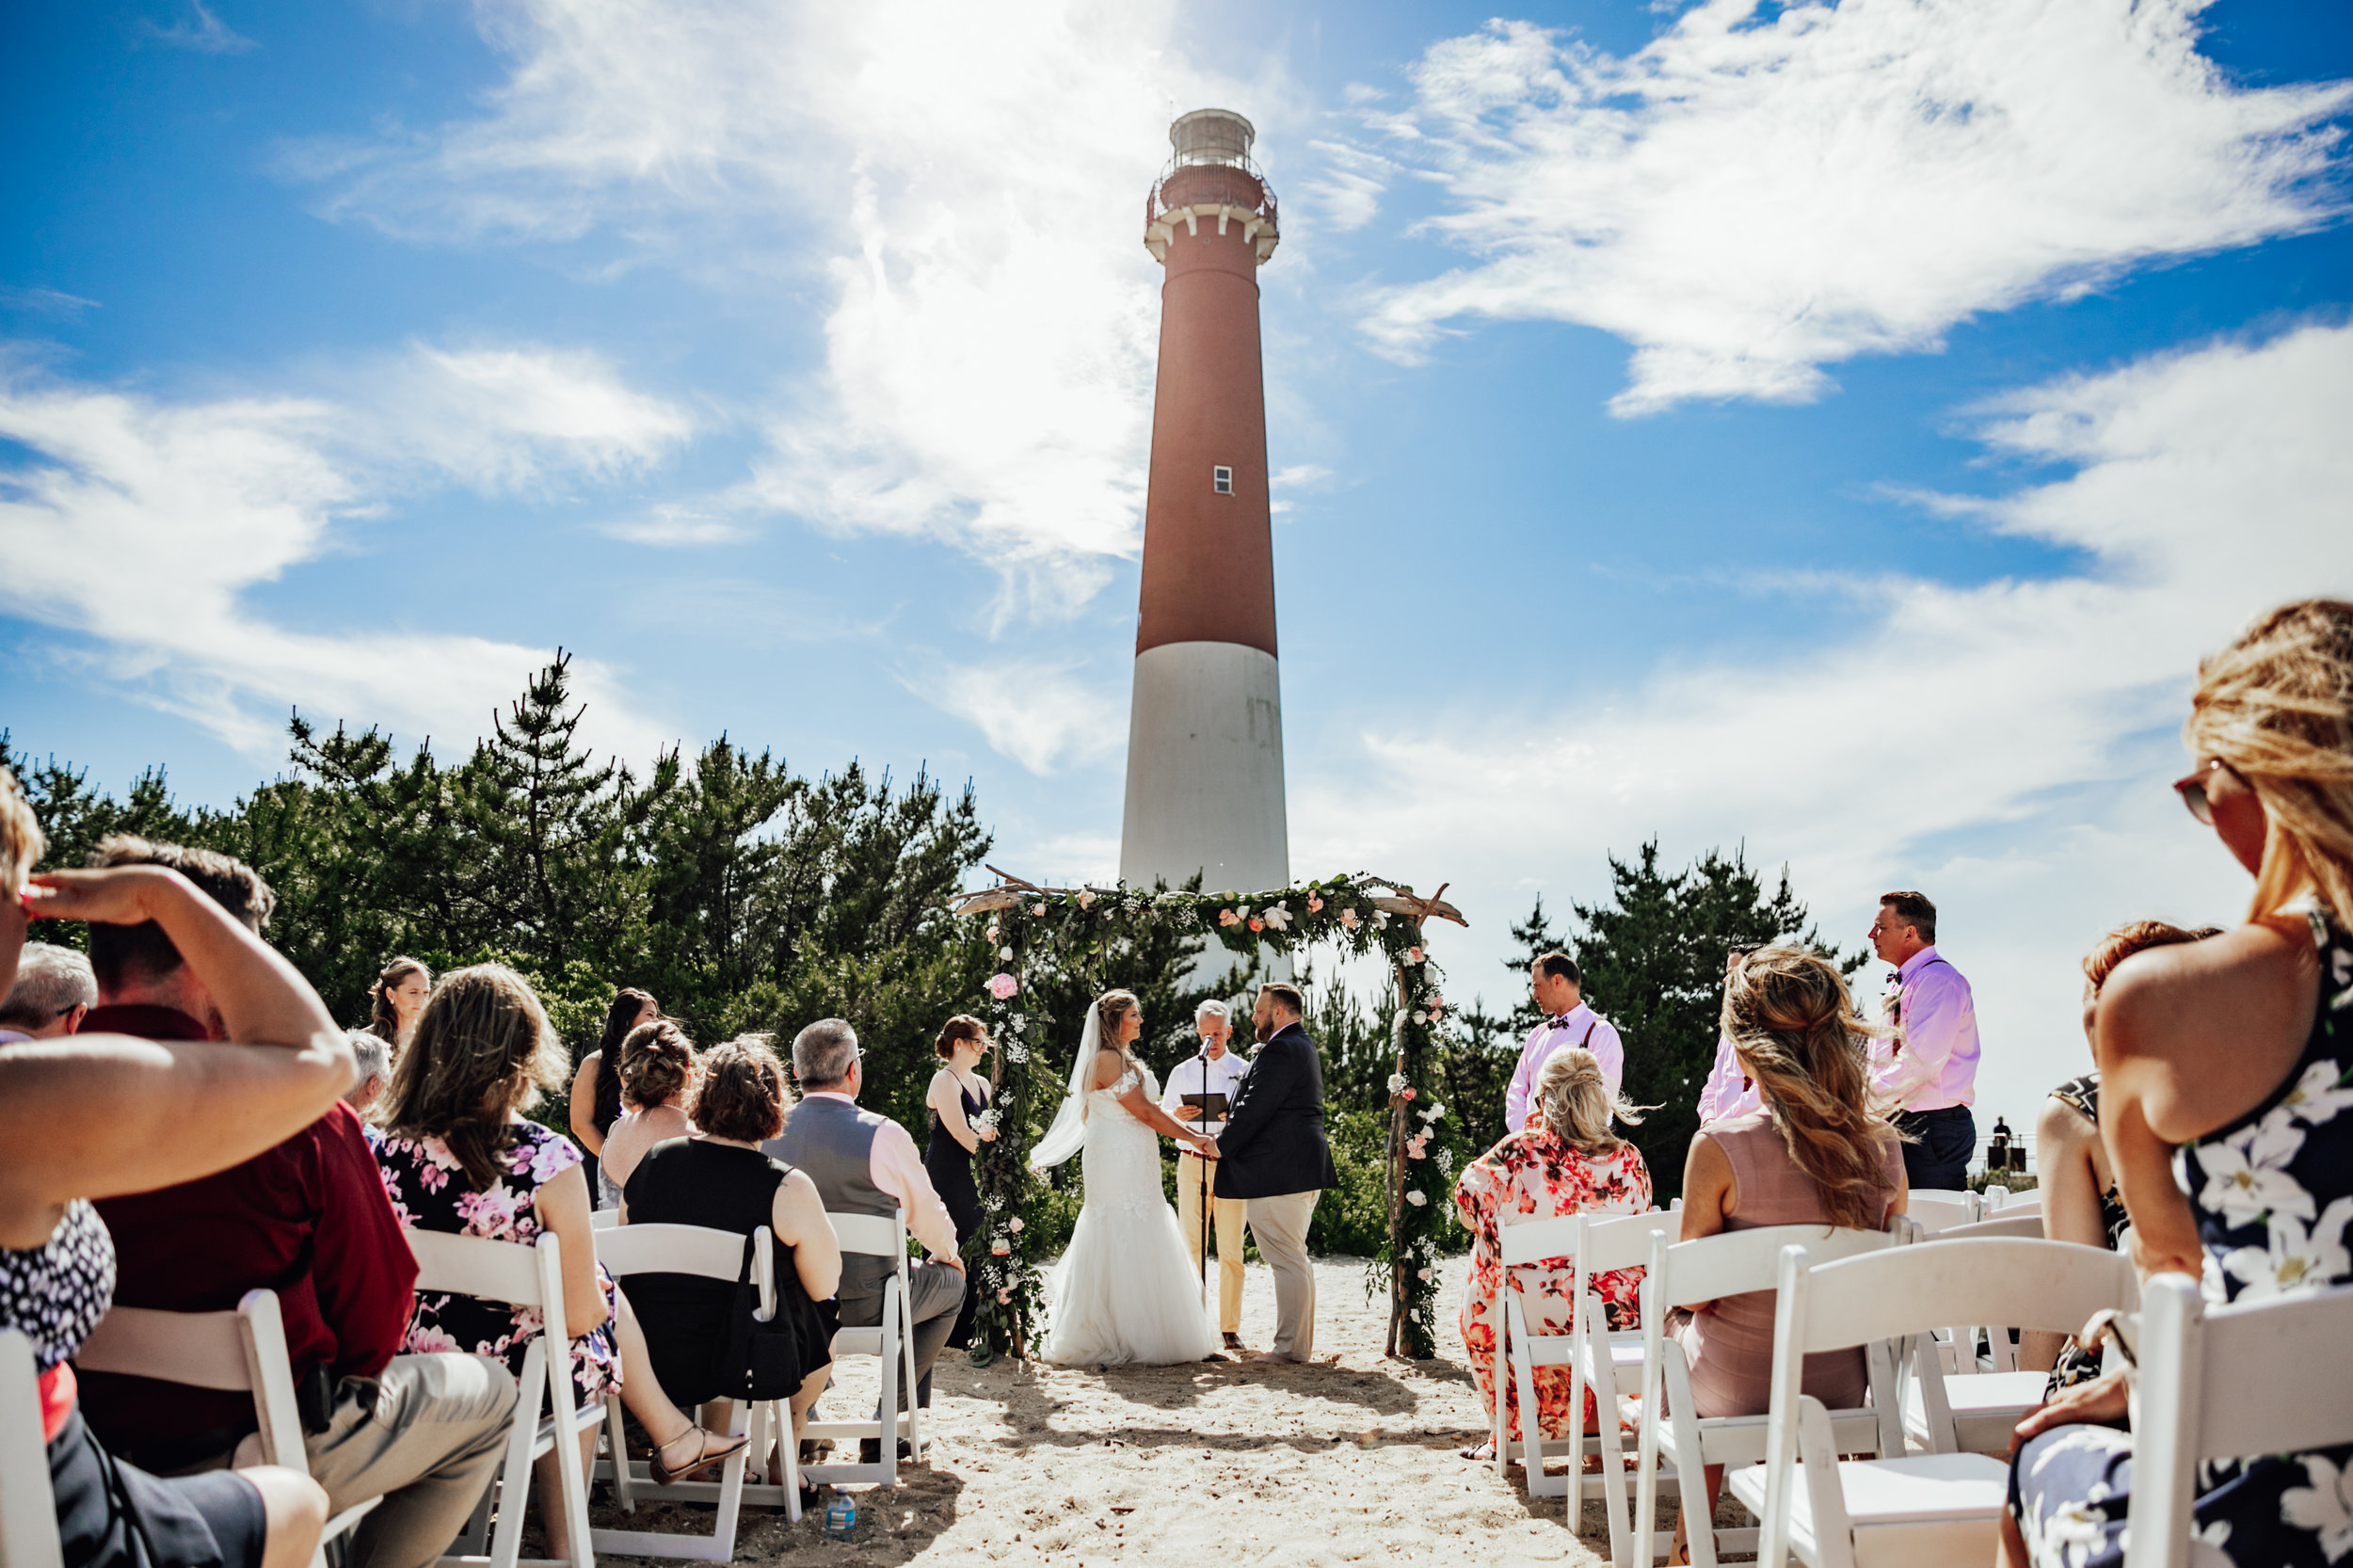 New Jersey Wedding Photographer, Felsberg Photography LBI wedding photography 71.jpg